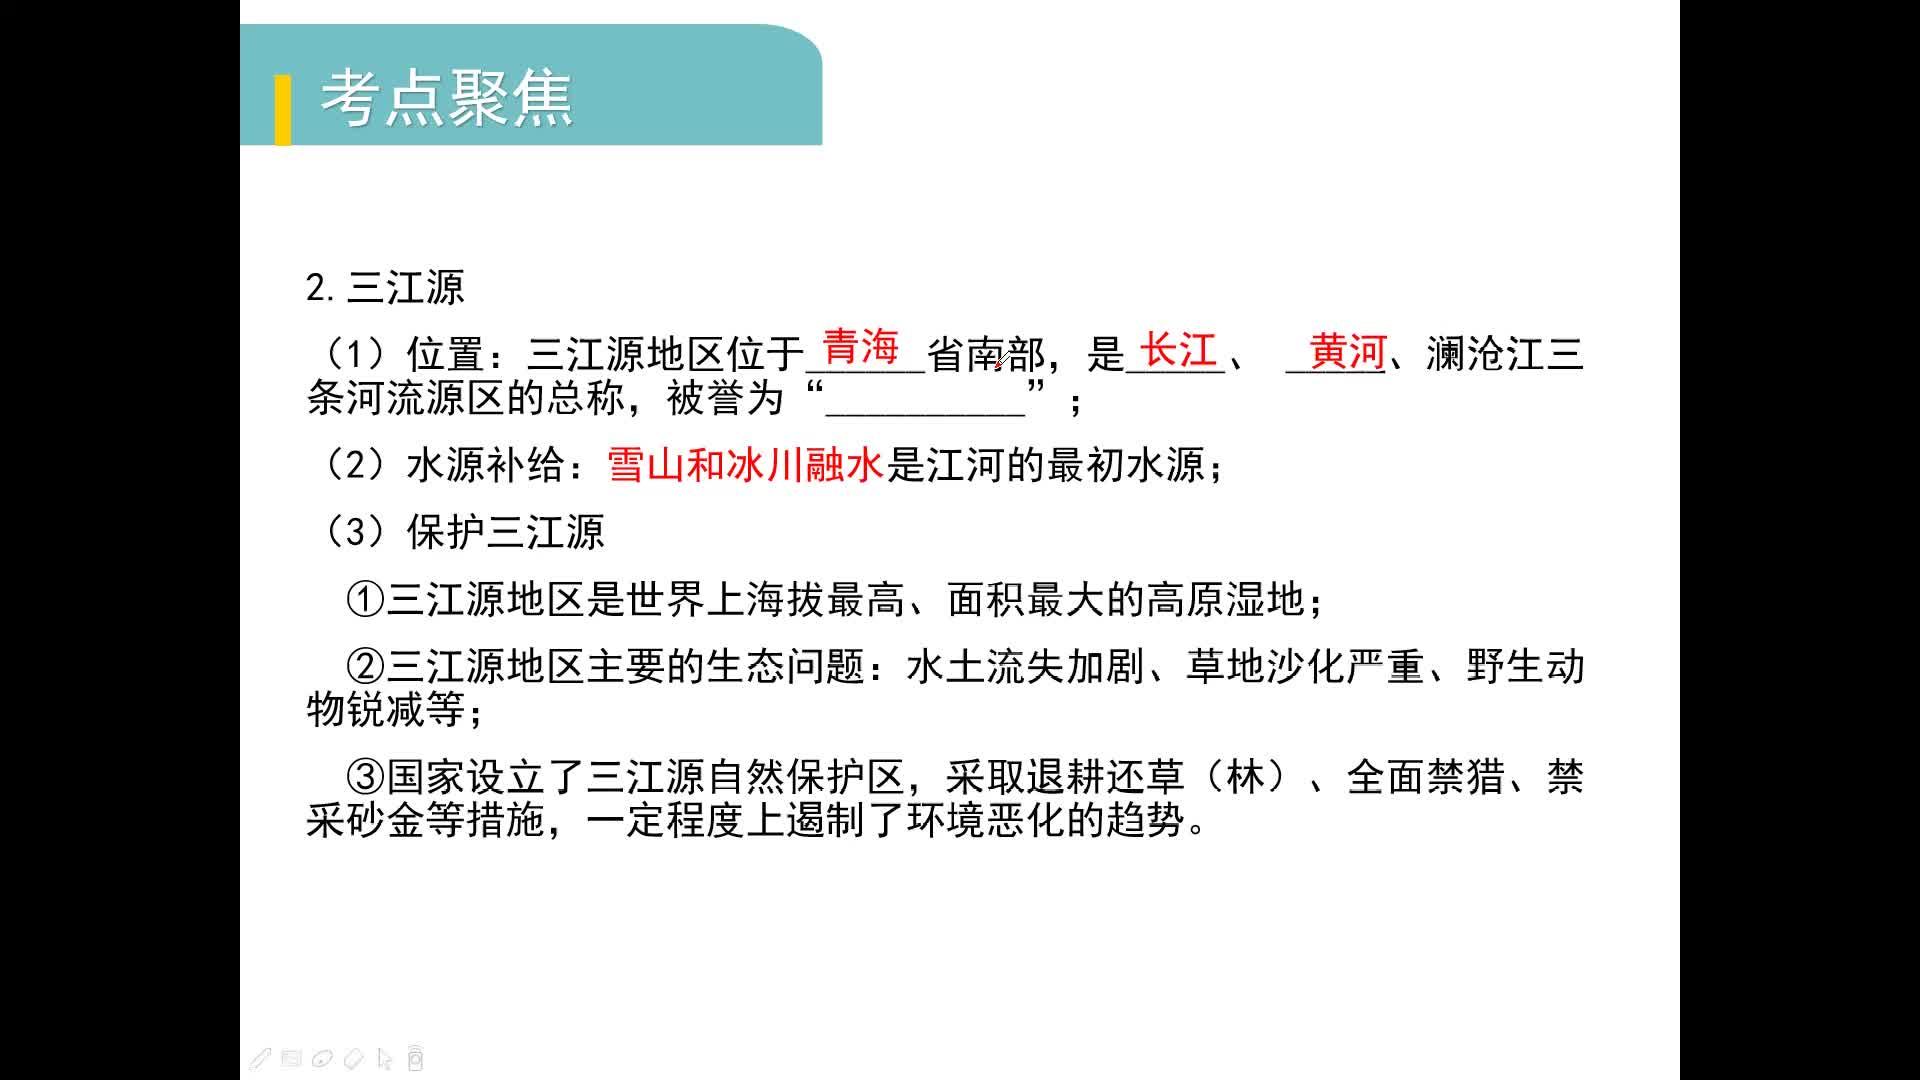 中考復習(xi)25青(qing)藏(cang)地區 視頻